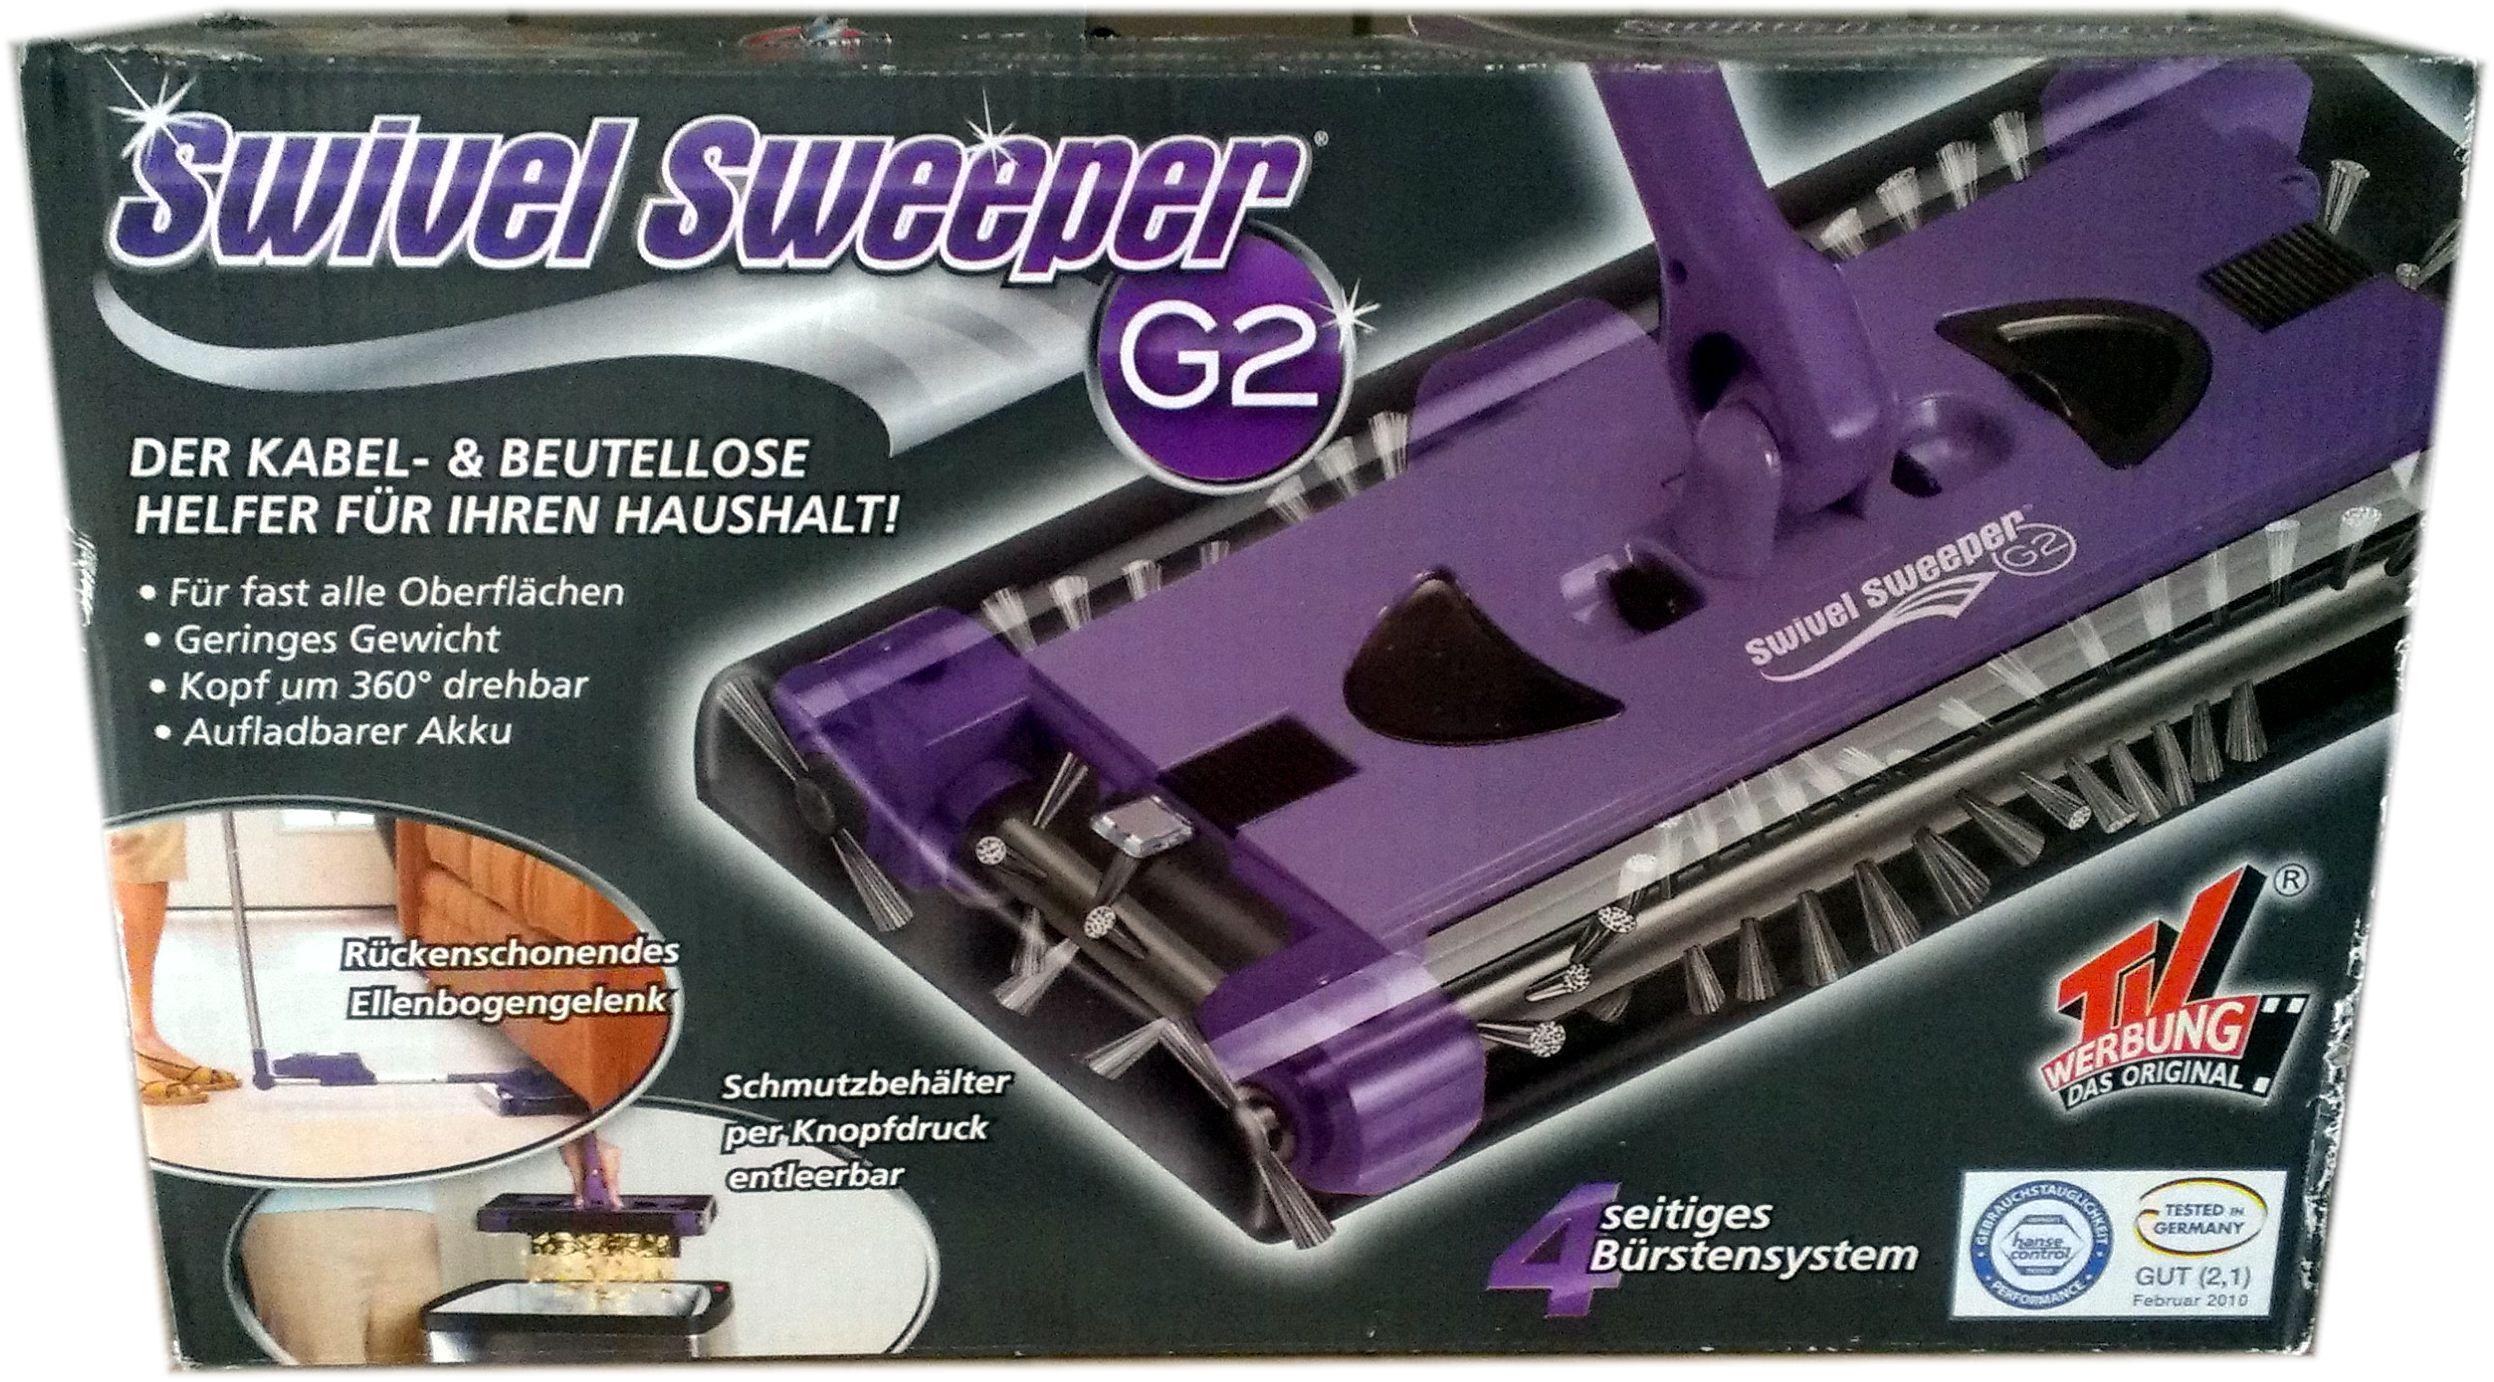 akku besen swivel sweeper g2 bekannt aus der tv werbung neu lila ebay. Black Bedroom Furniture Sets. Home Design Ideas